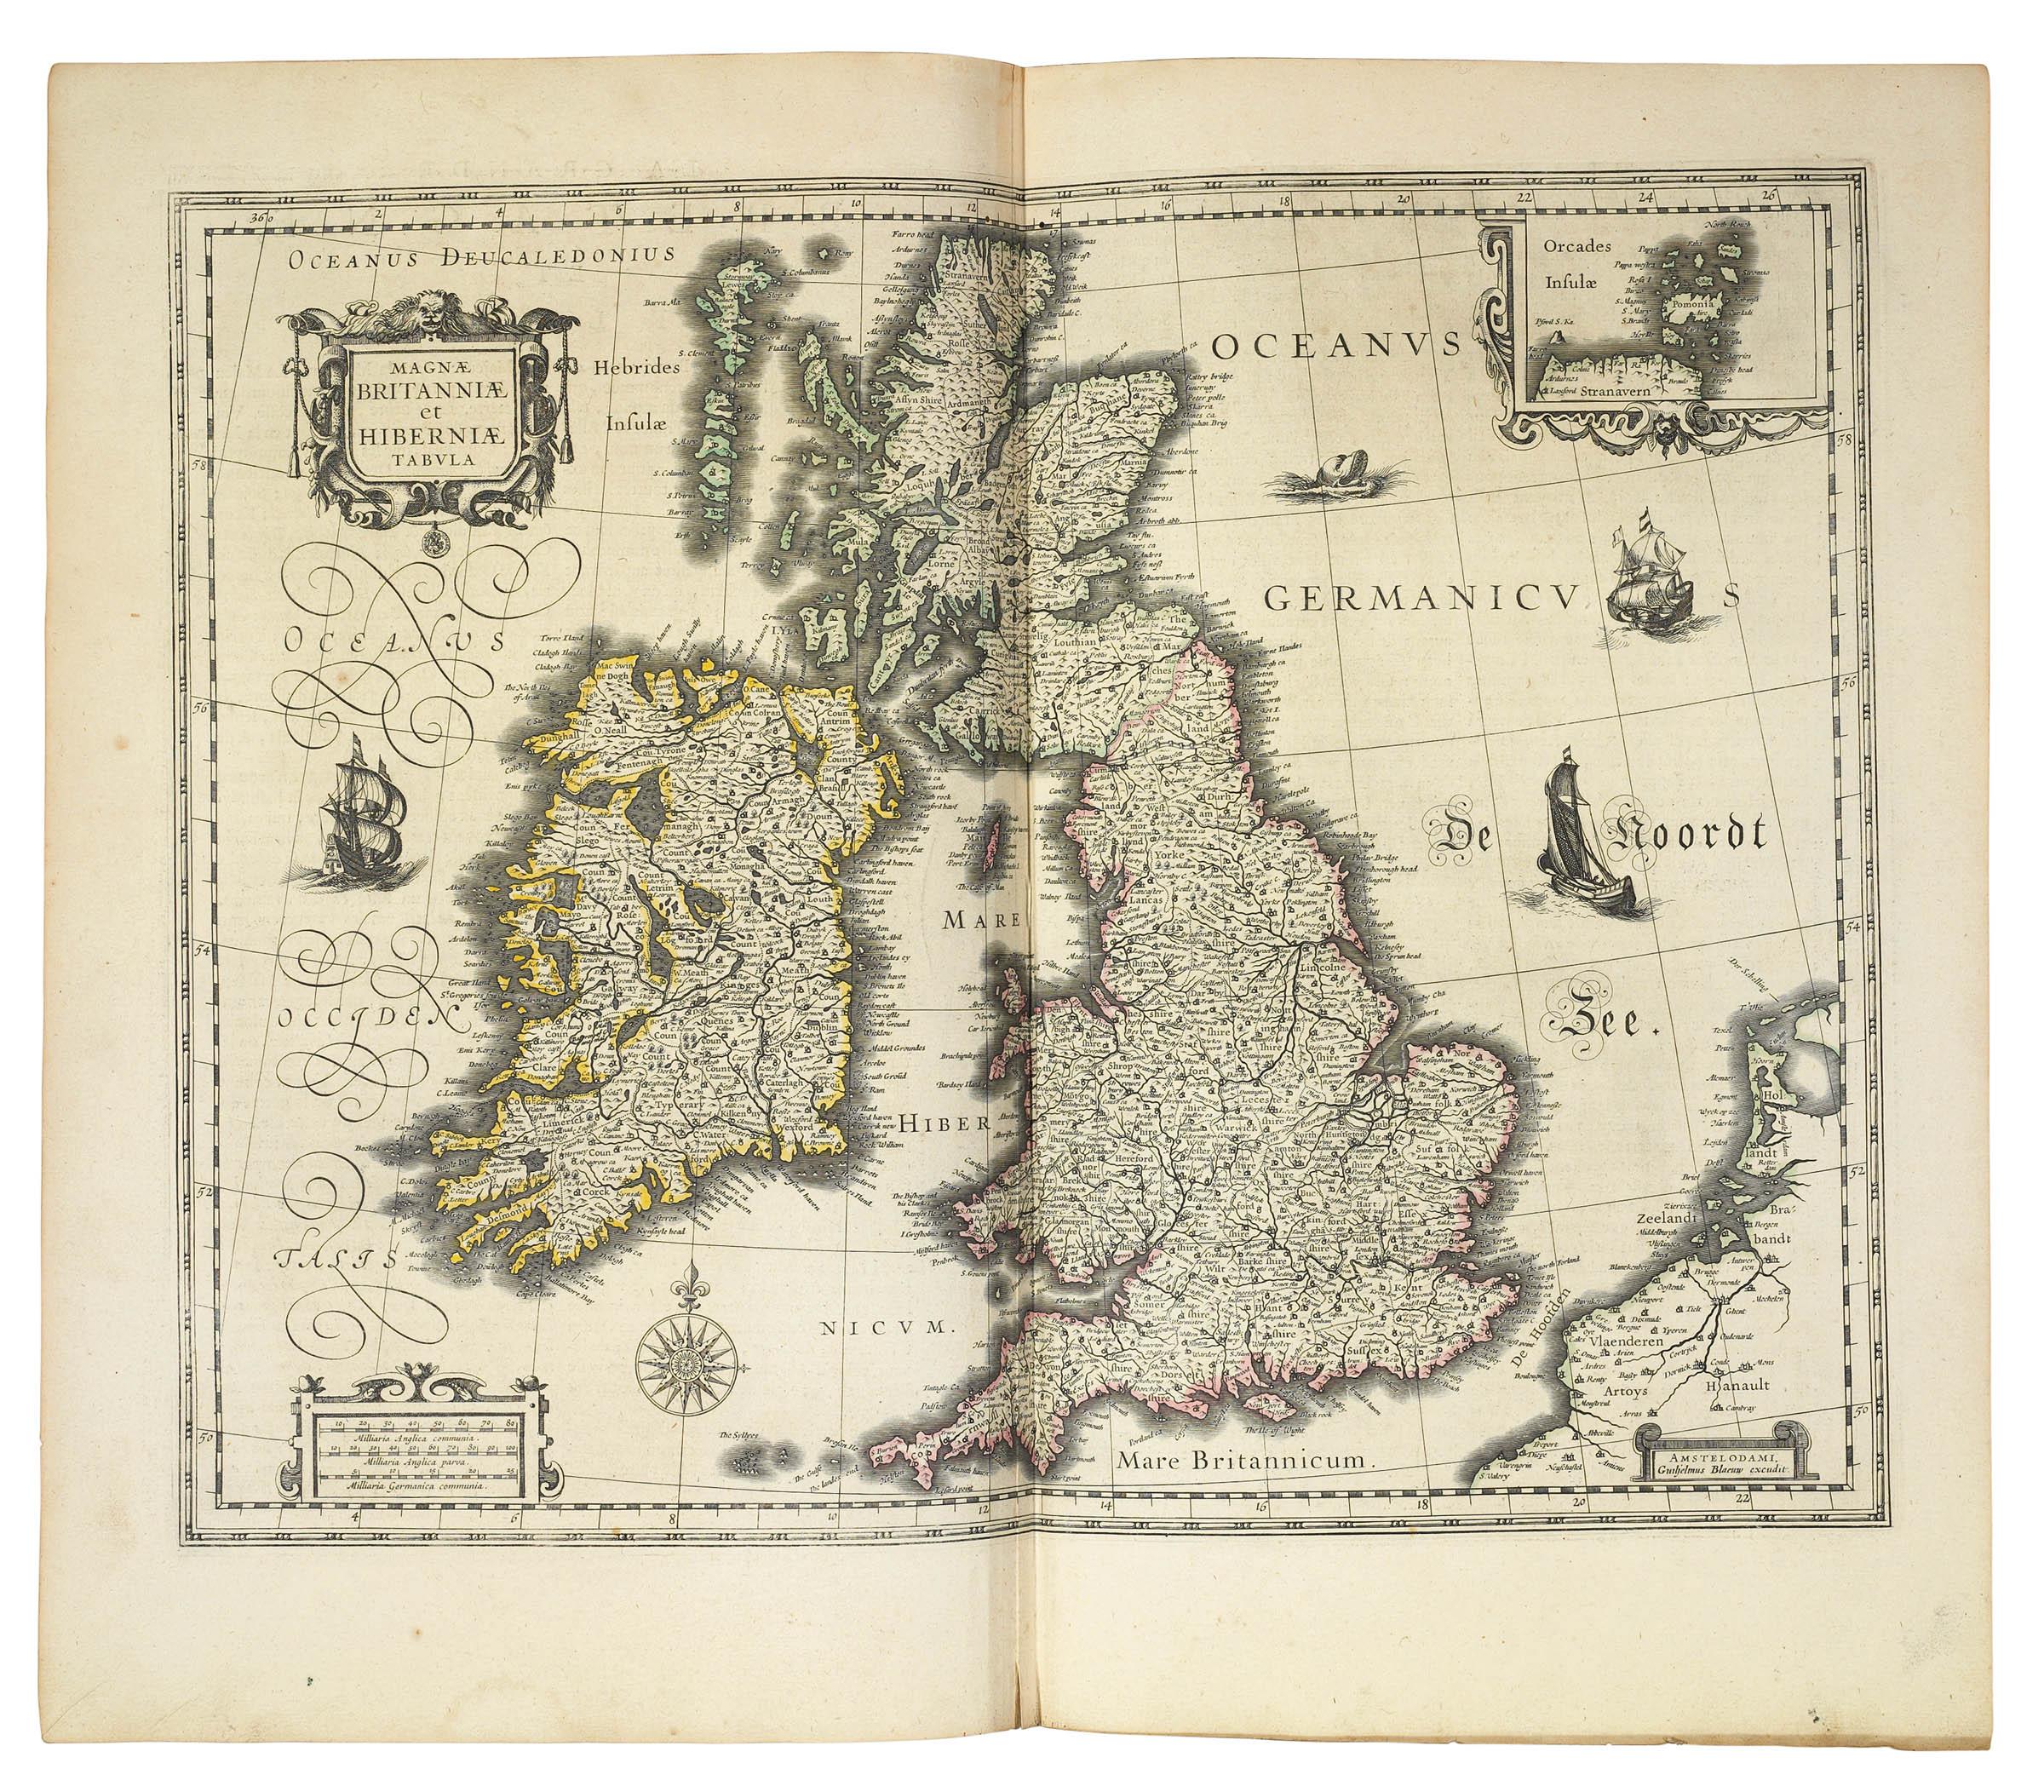 BLAEU, Willem (1571-1638) and Johannes BLAEU (1596-1673). Le Theatre du Monde ou Nouvel Atlas ... troisieme partie. [Volume III. Italy, Greece and the British Isles]. Amsterdam: Johannes and Cornelius Blaeu, 1640.